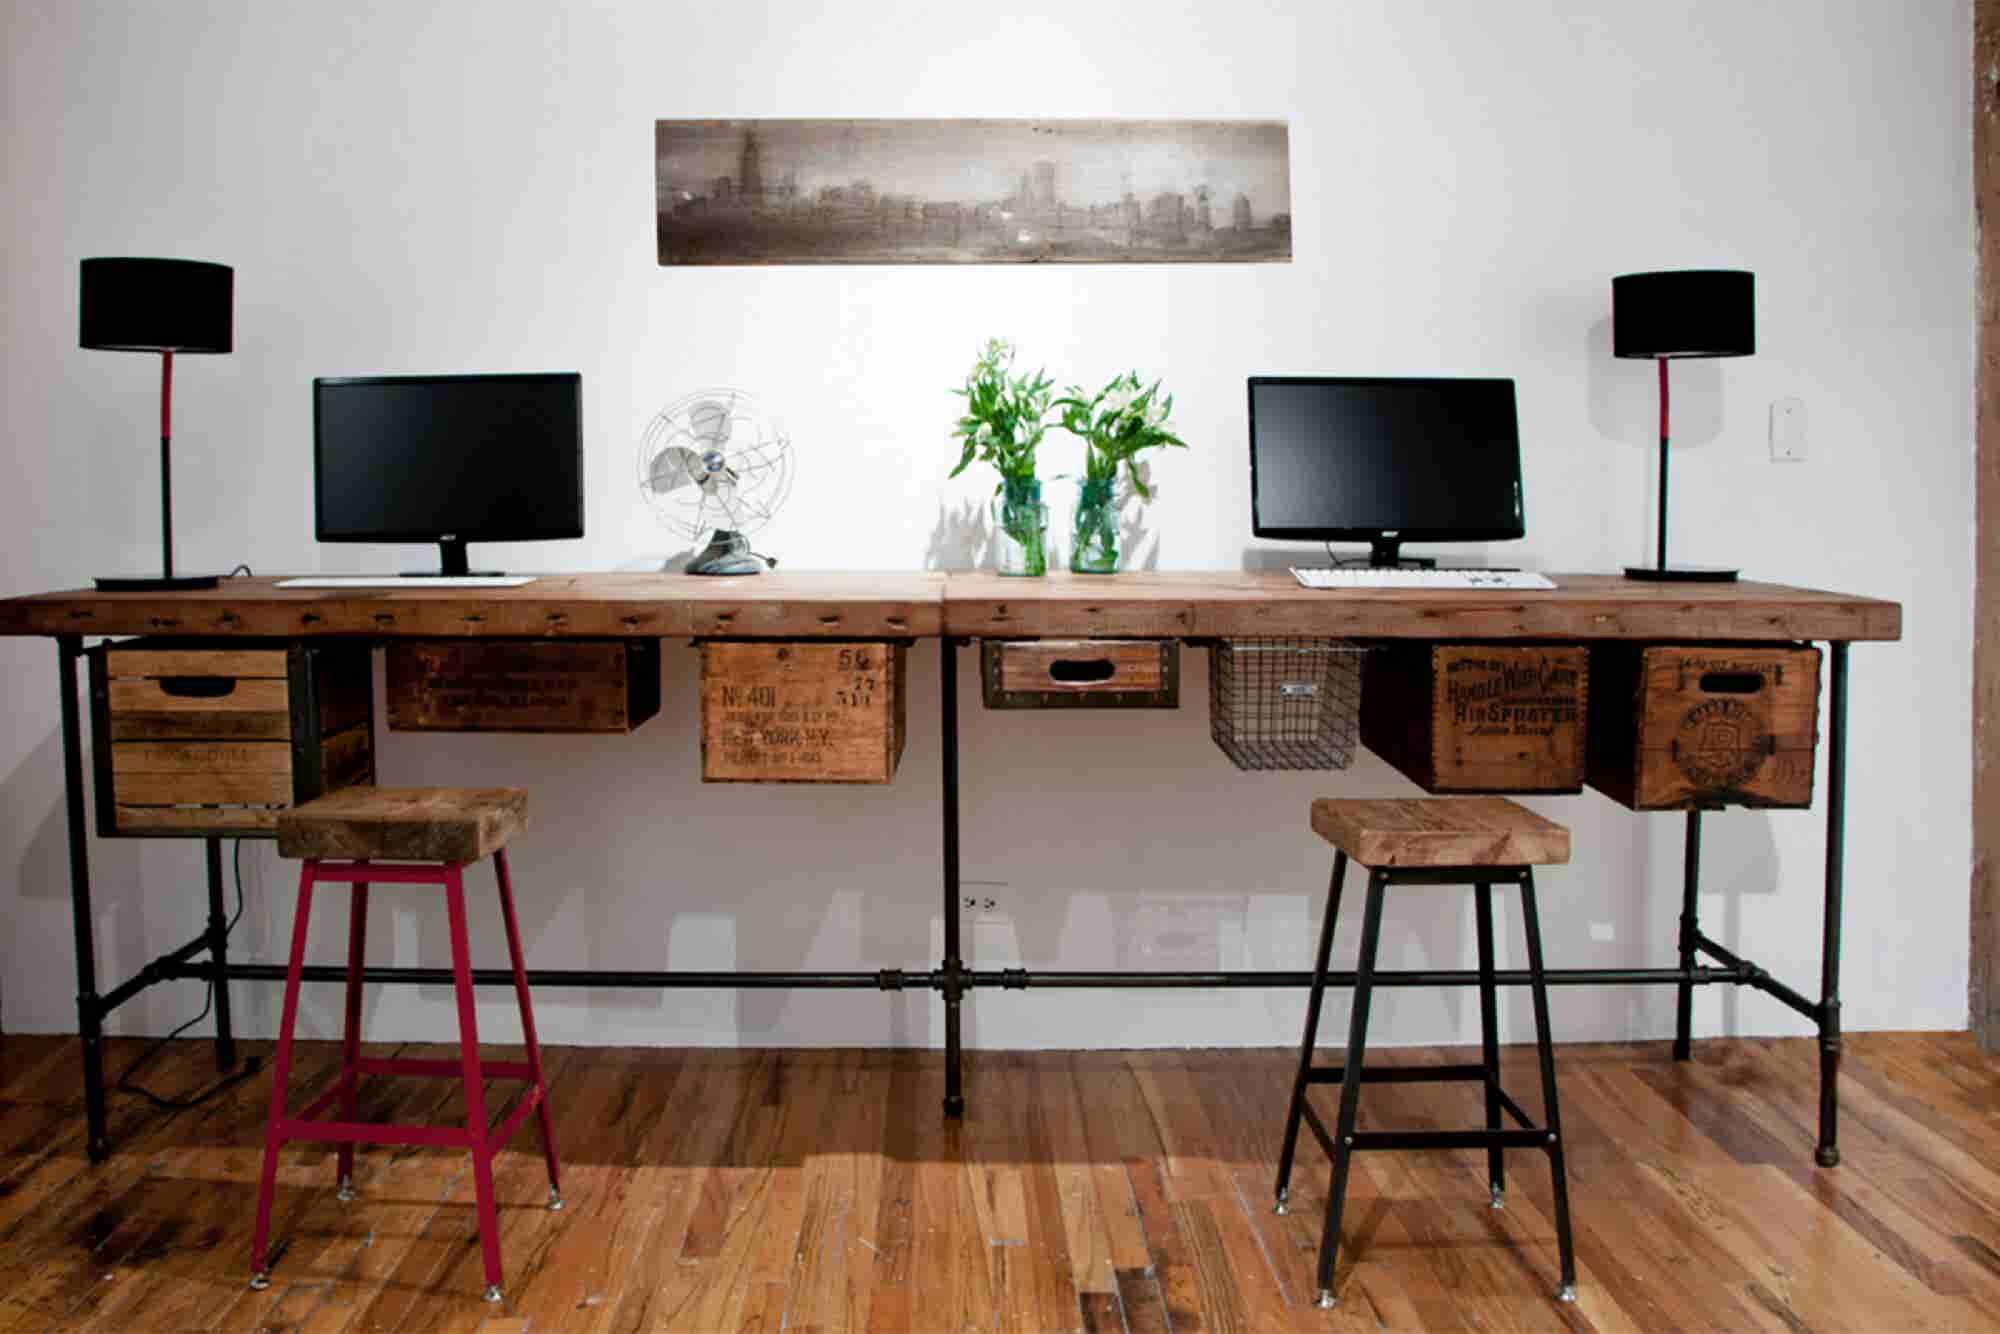 12 Ideas for Creative Desks